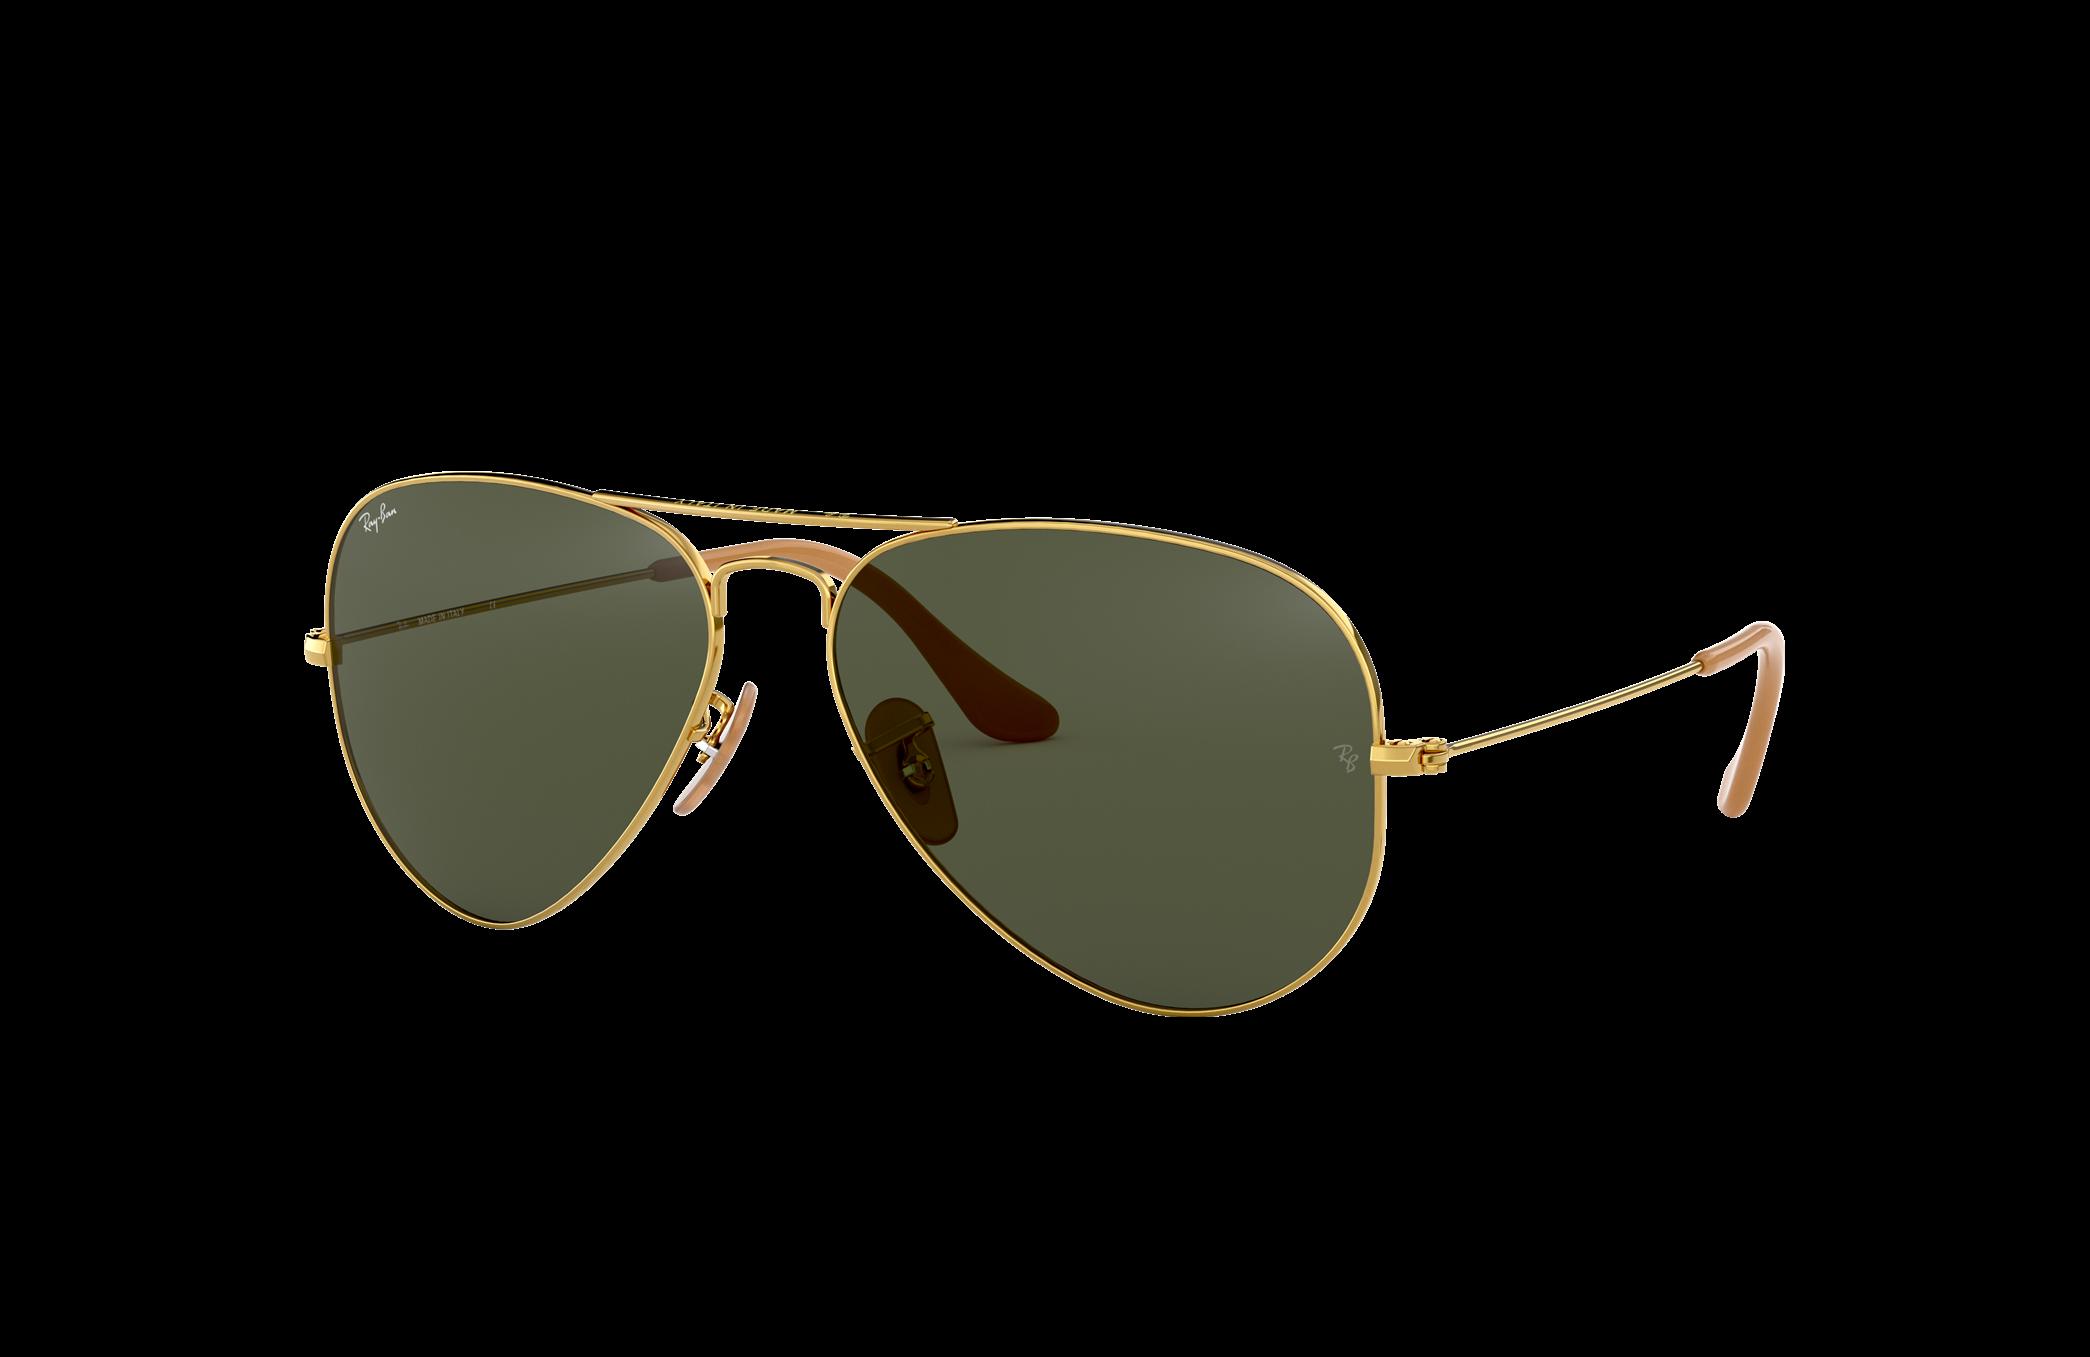 Ray-Ban Aviator 1937 Gold, Green Lenses - RB3025